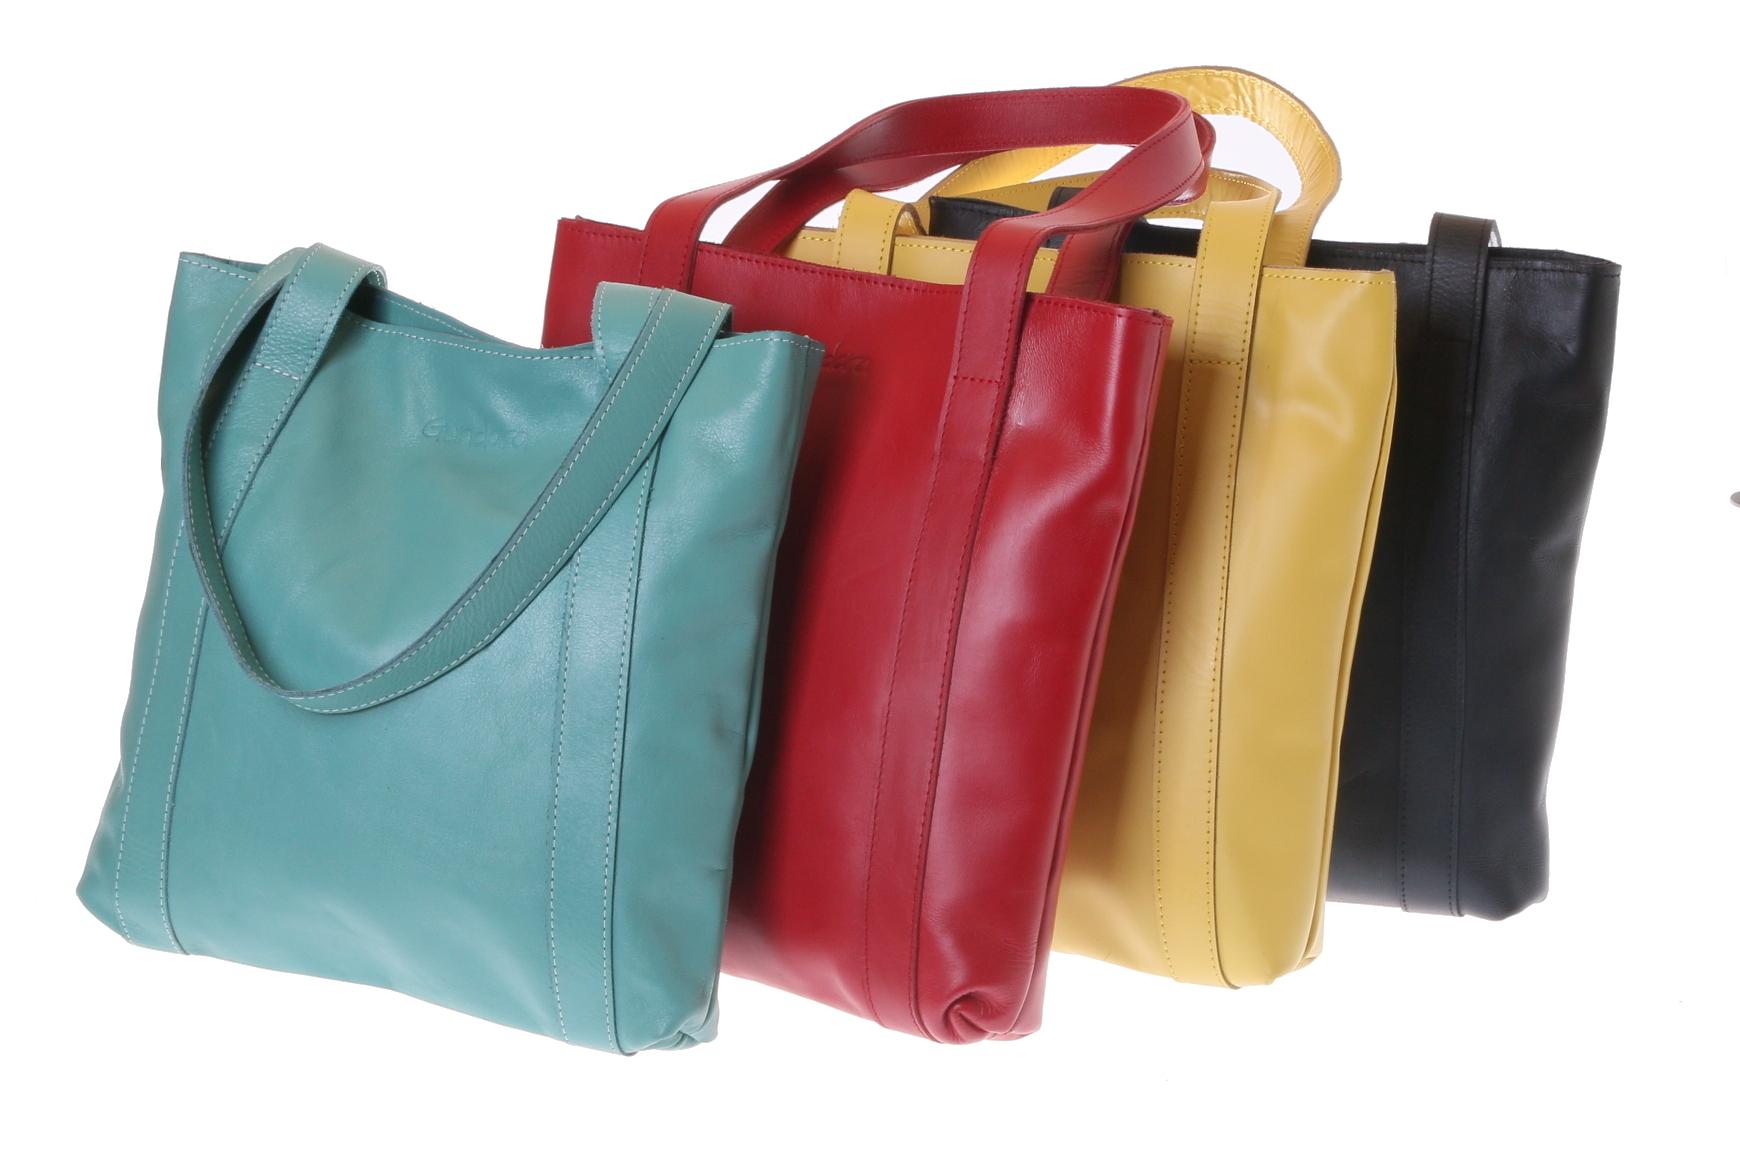 Gundara - shoulder bag - genuine cow leather - handmade in Ethiopia